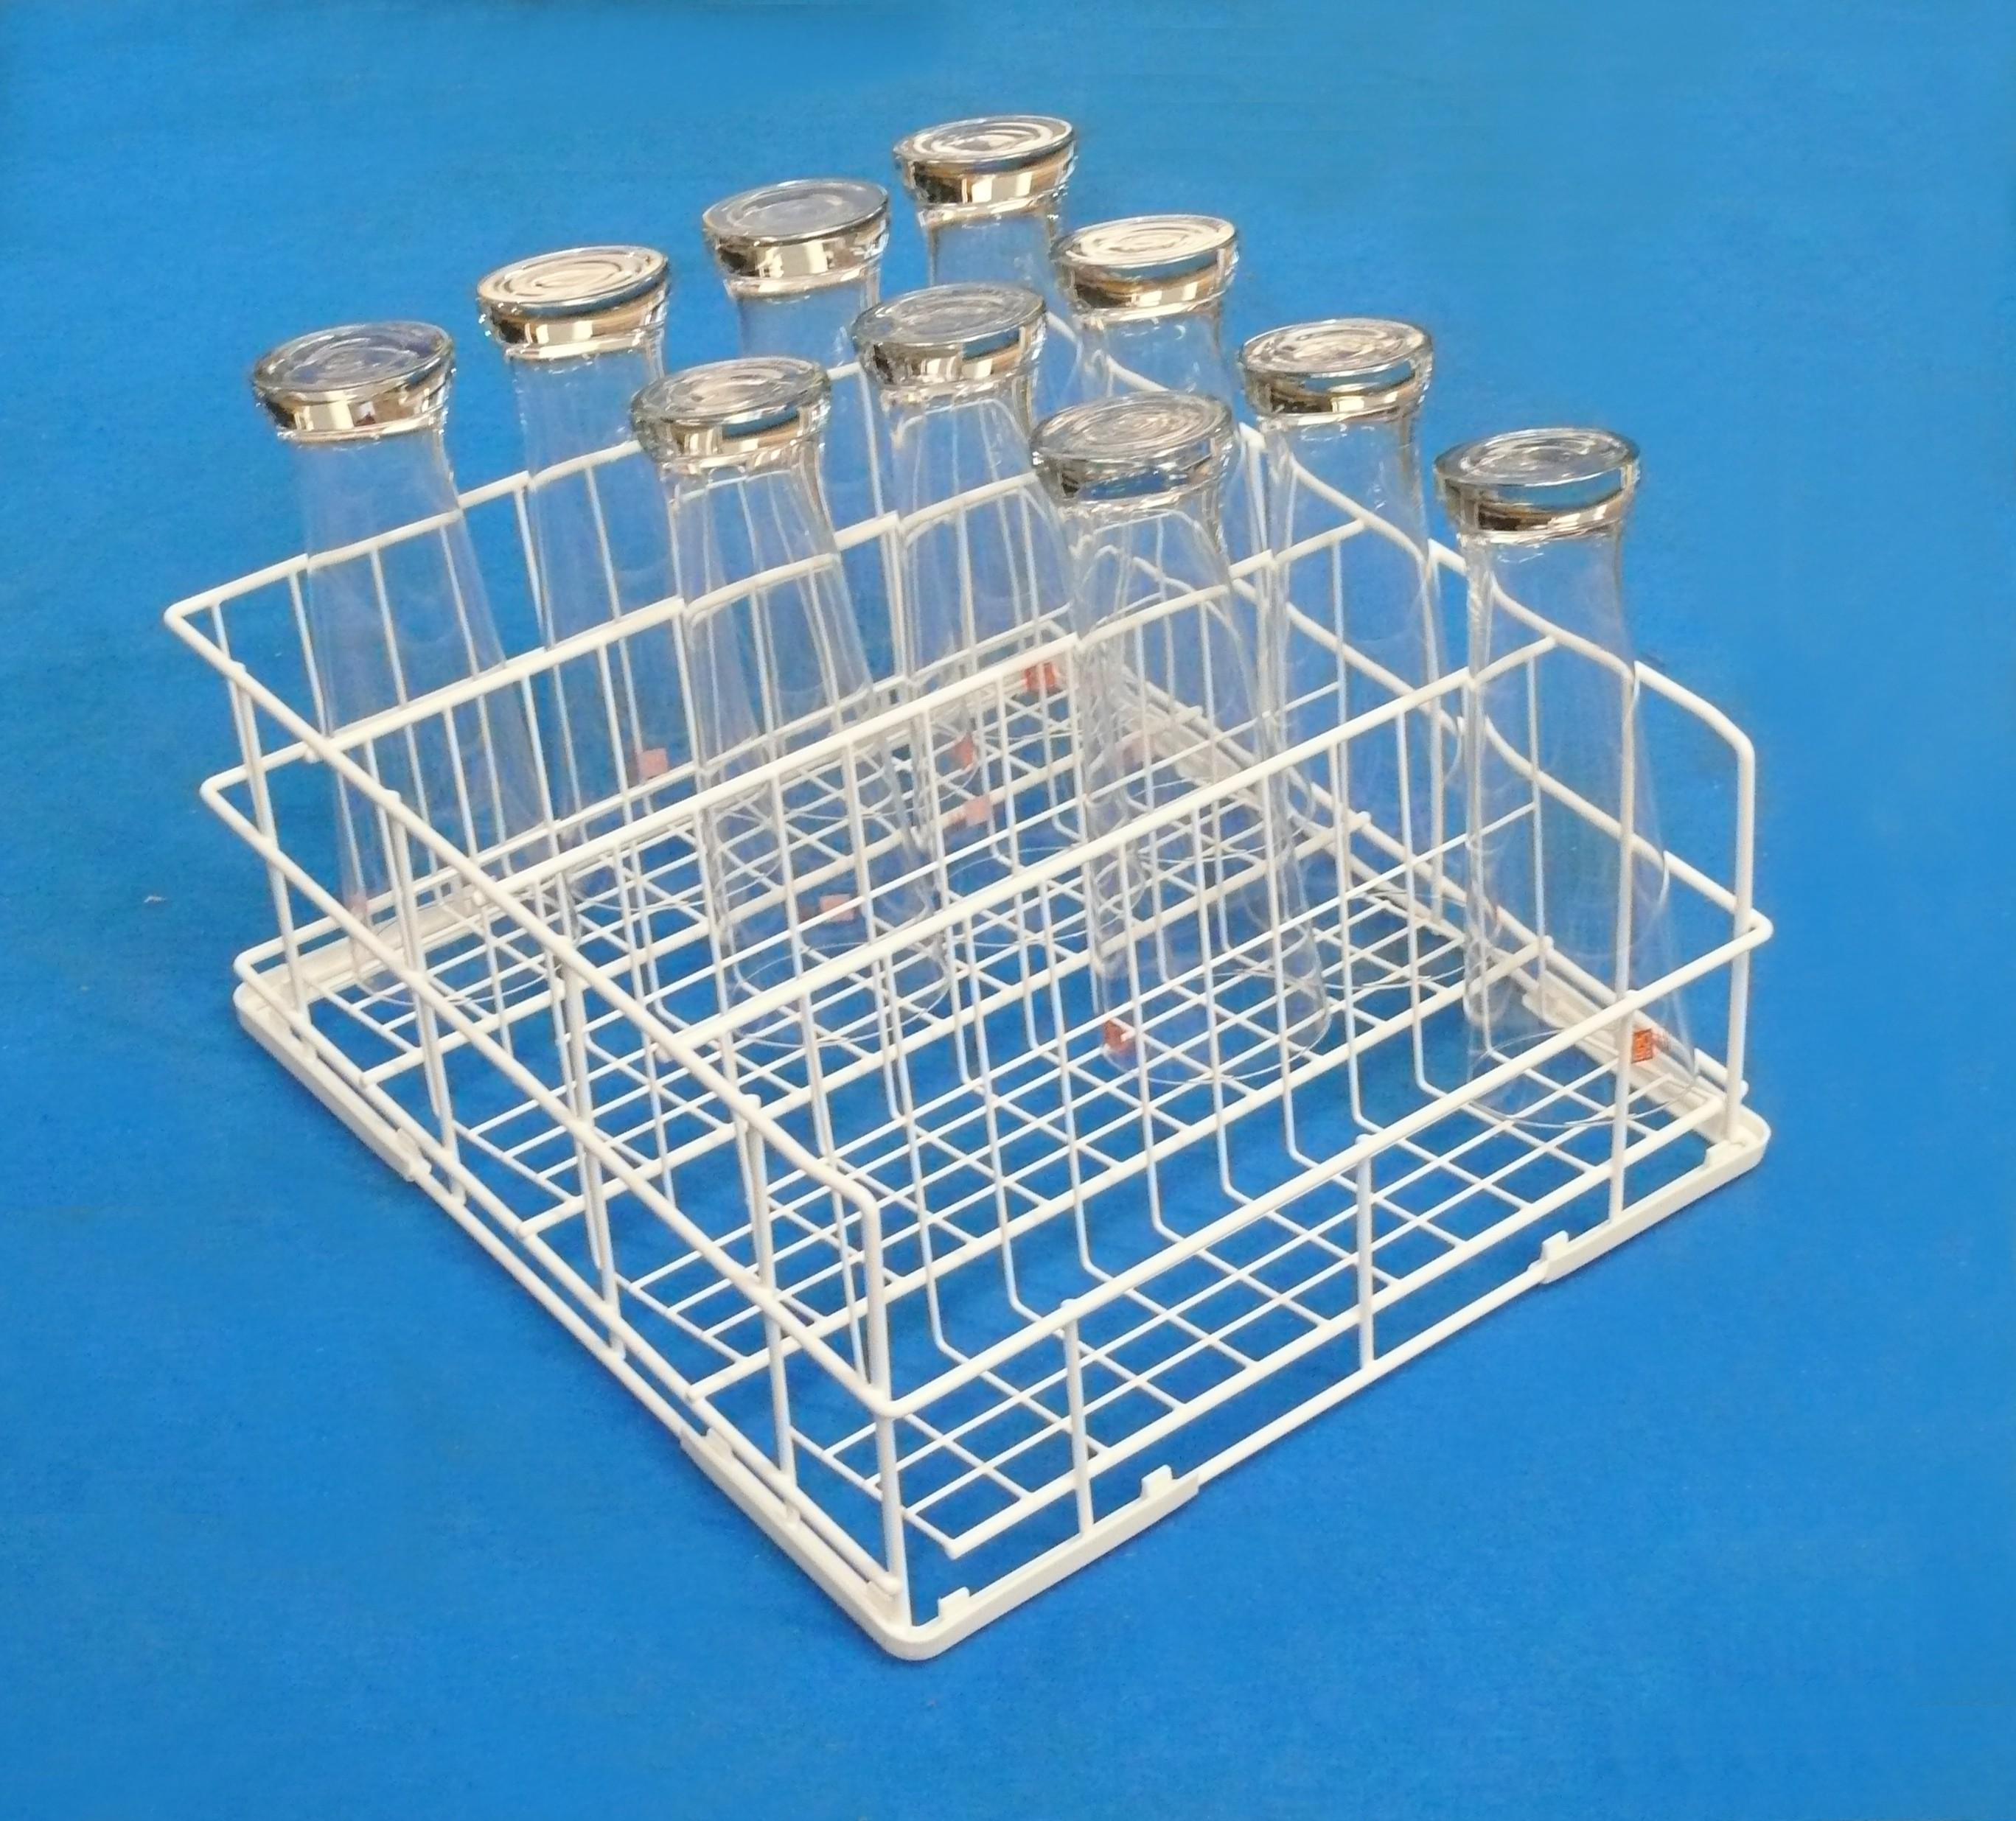 Eurodib USA CC00075 commercial dishwashers & glasswashers - accessories